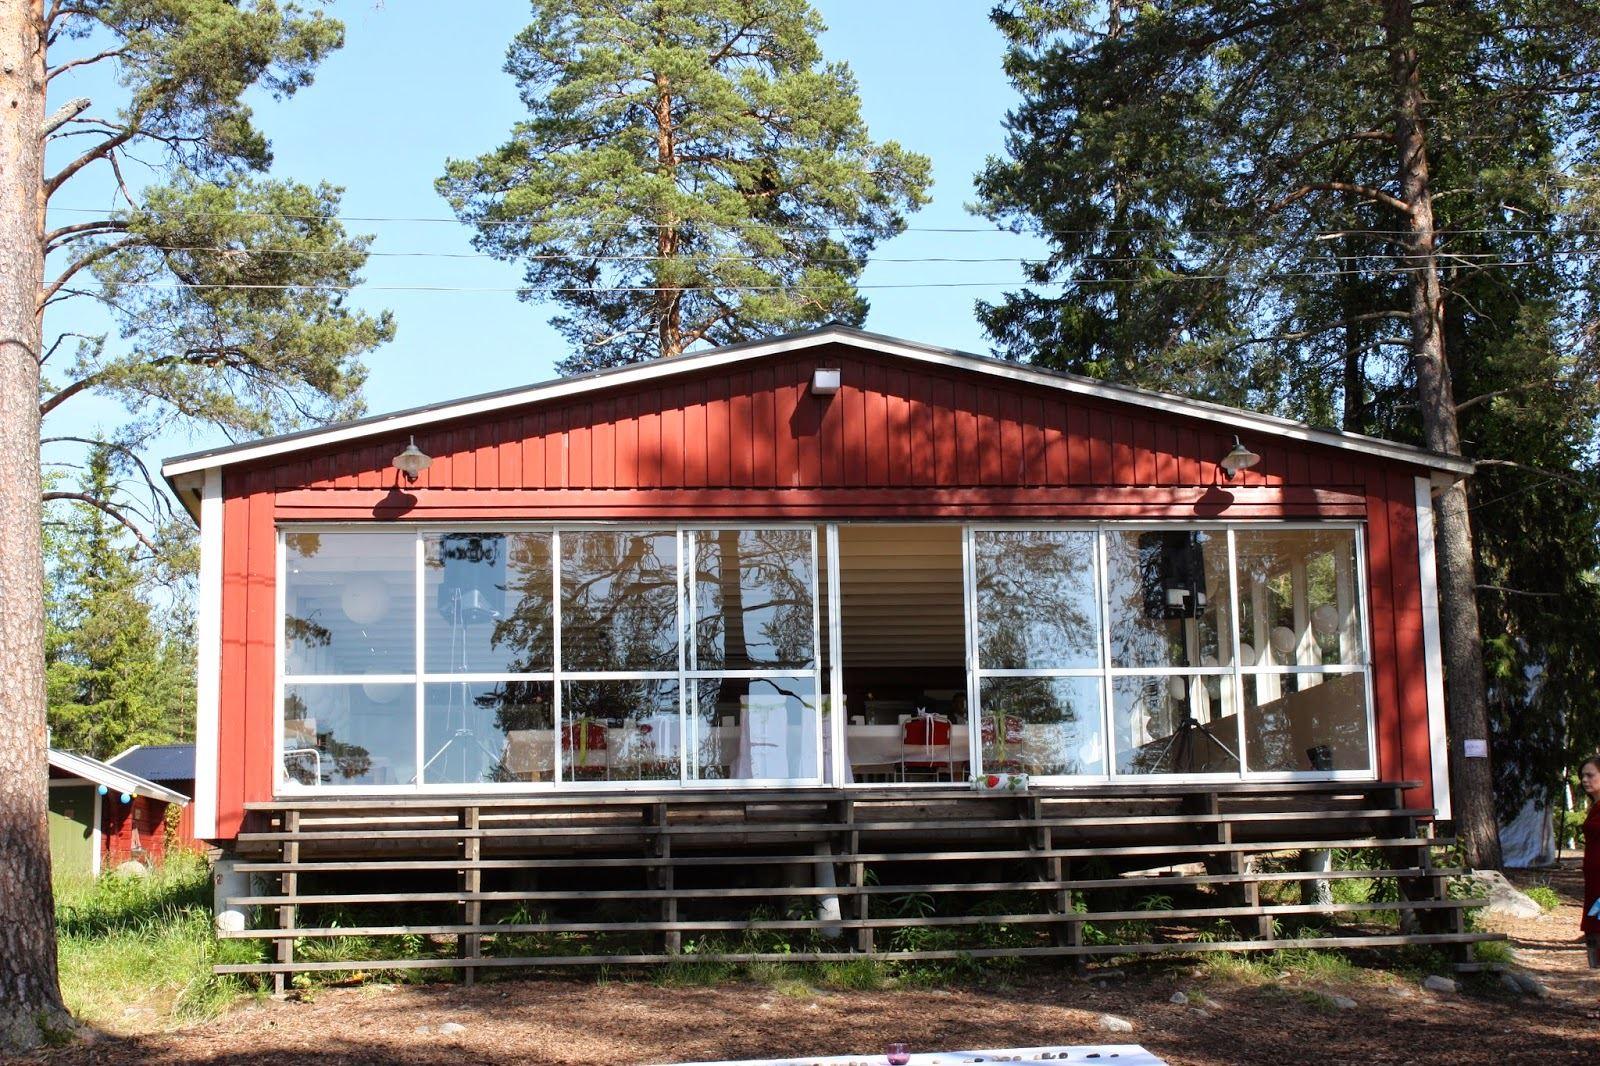 © KFUM Umeå, Nydala Aktivitetscenter